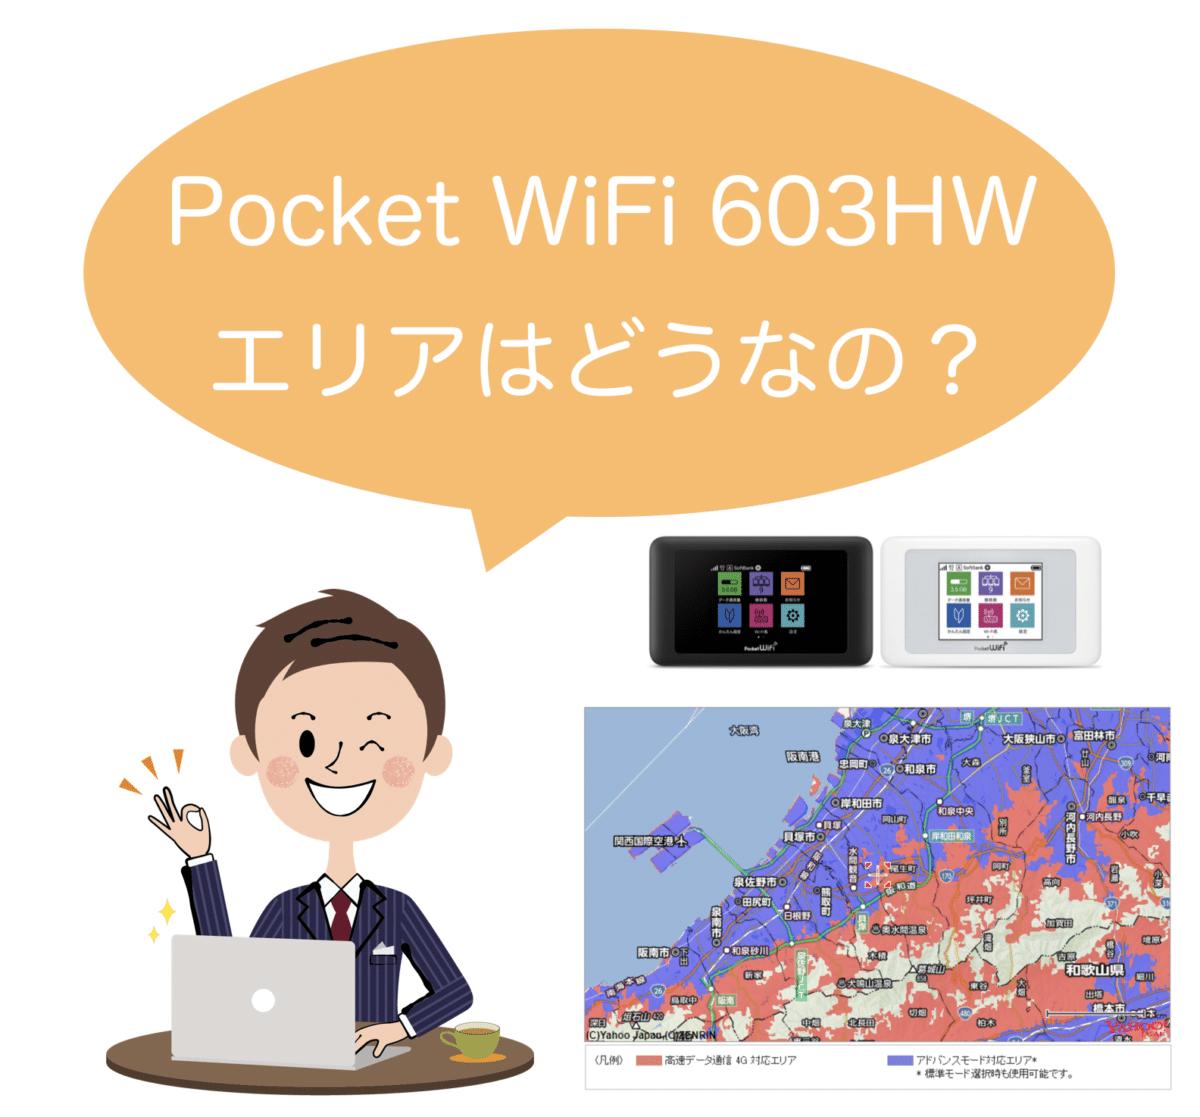 Pocket Wi-Fi 603HWエリアを解説!利用できないエリアはどこ?